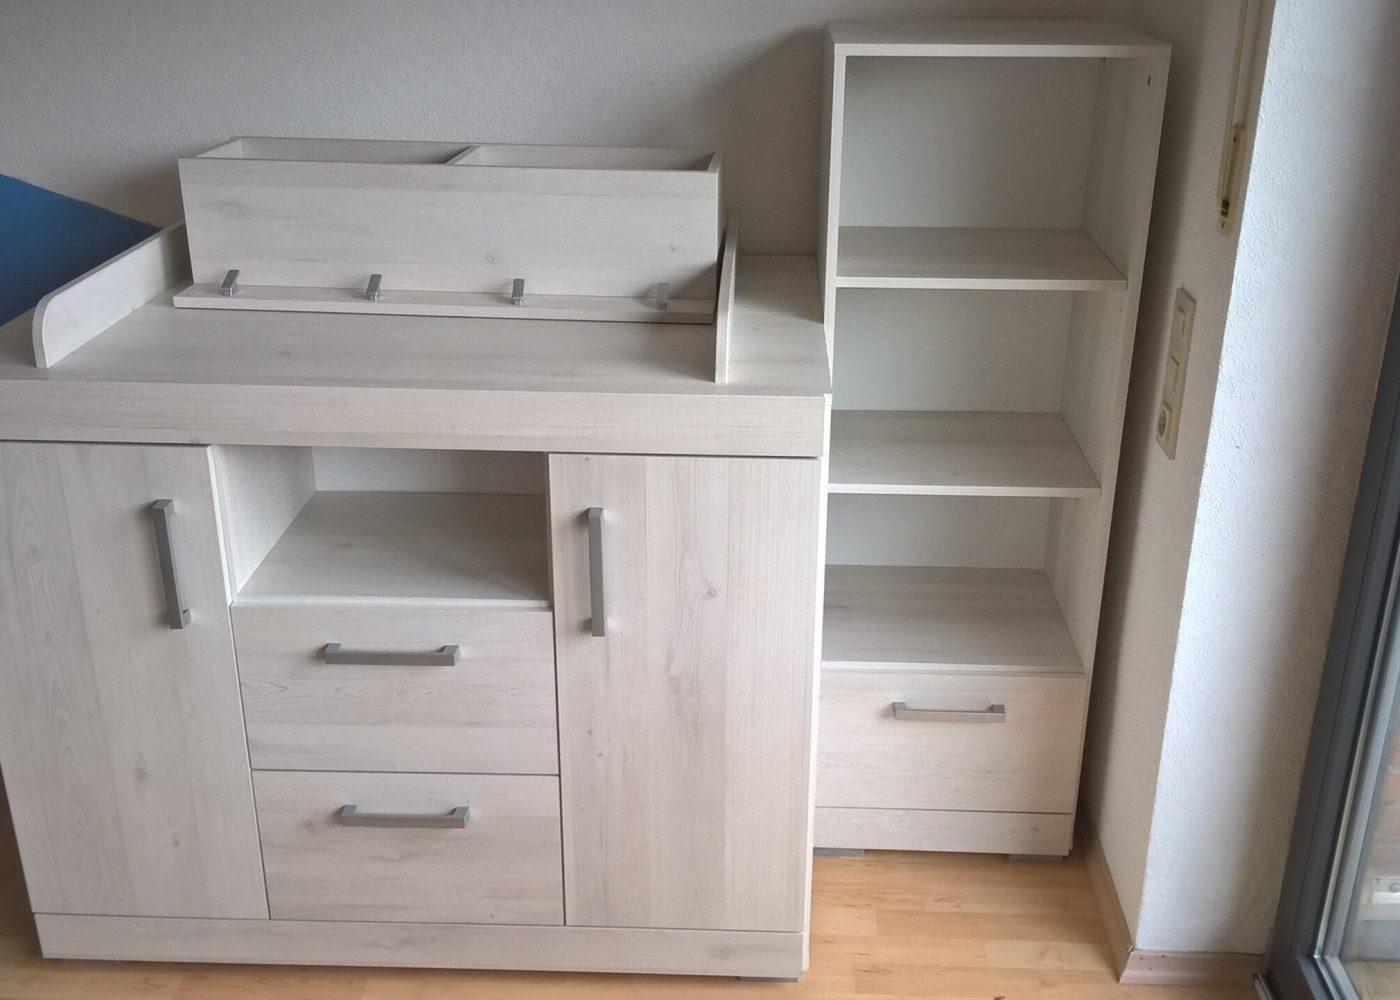 Möbel aufbauen Bougé Aachen